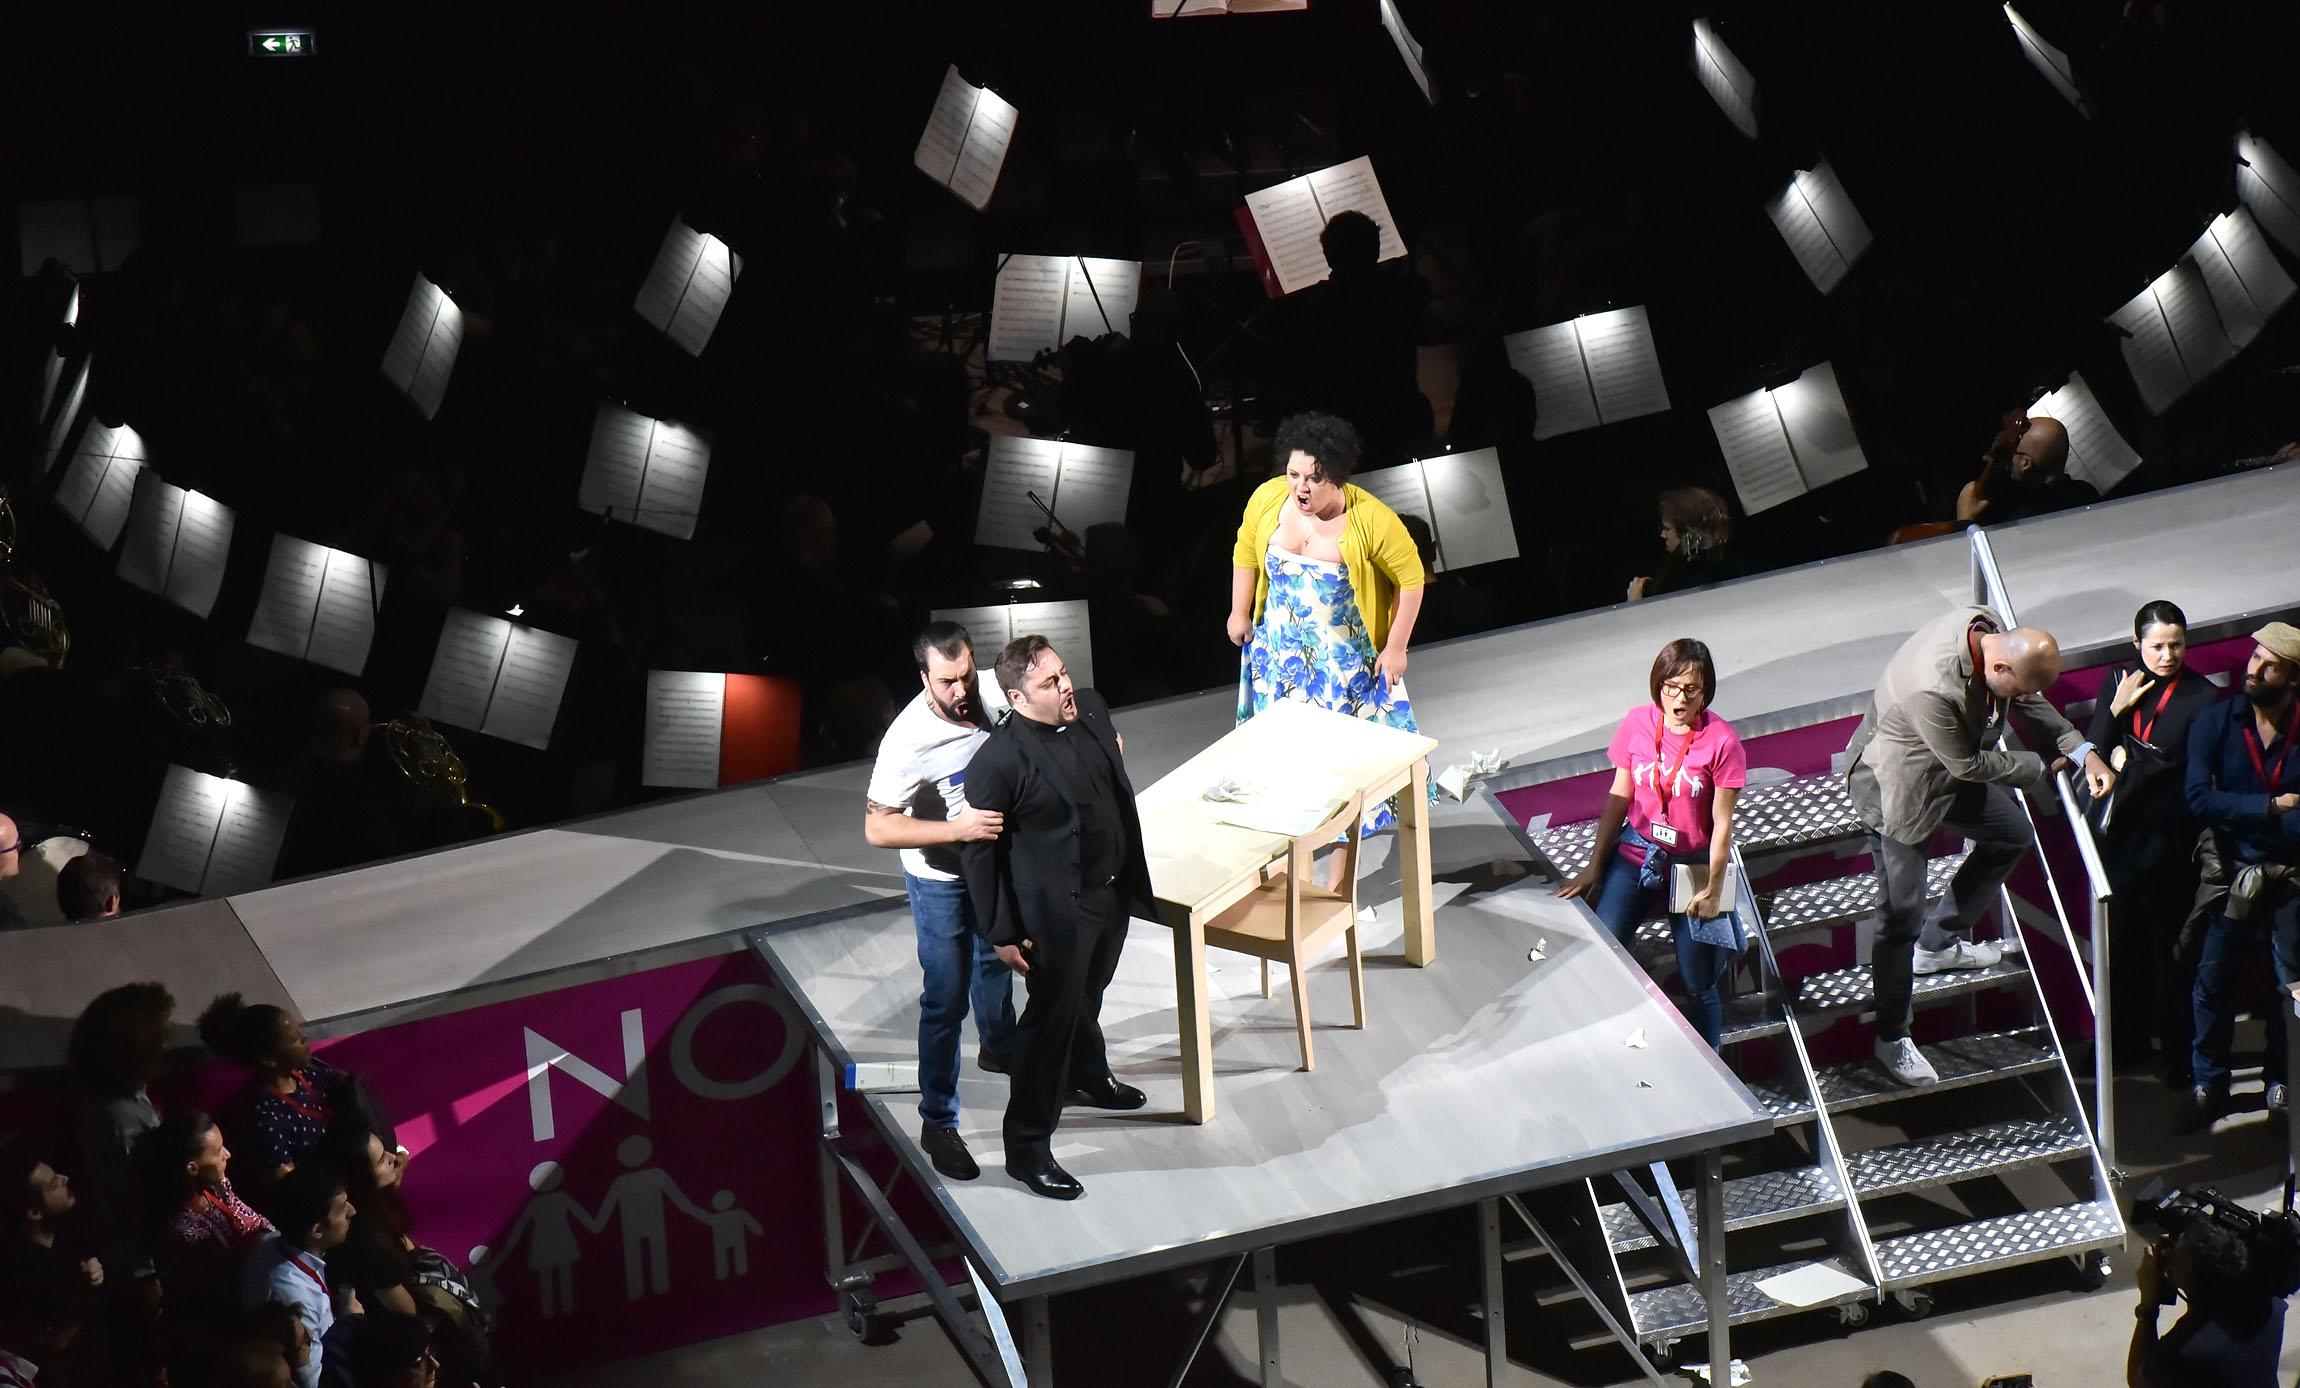 Giovanni Sala (Raffaele), Luciano Ganci (Stiffelio), Maria Katzarava (Lina), Cecilia Bernini (Dorotea), Blagoj Nacoski (Federico di Frengel), © Roberto Ricci